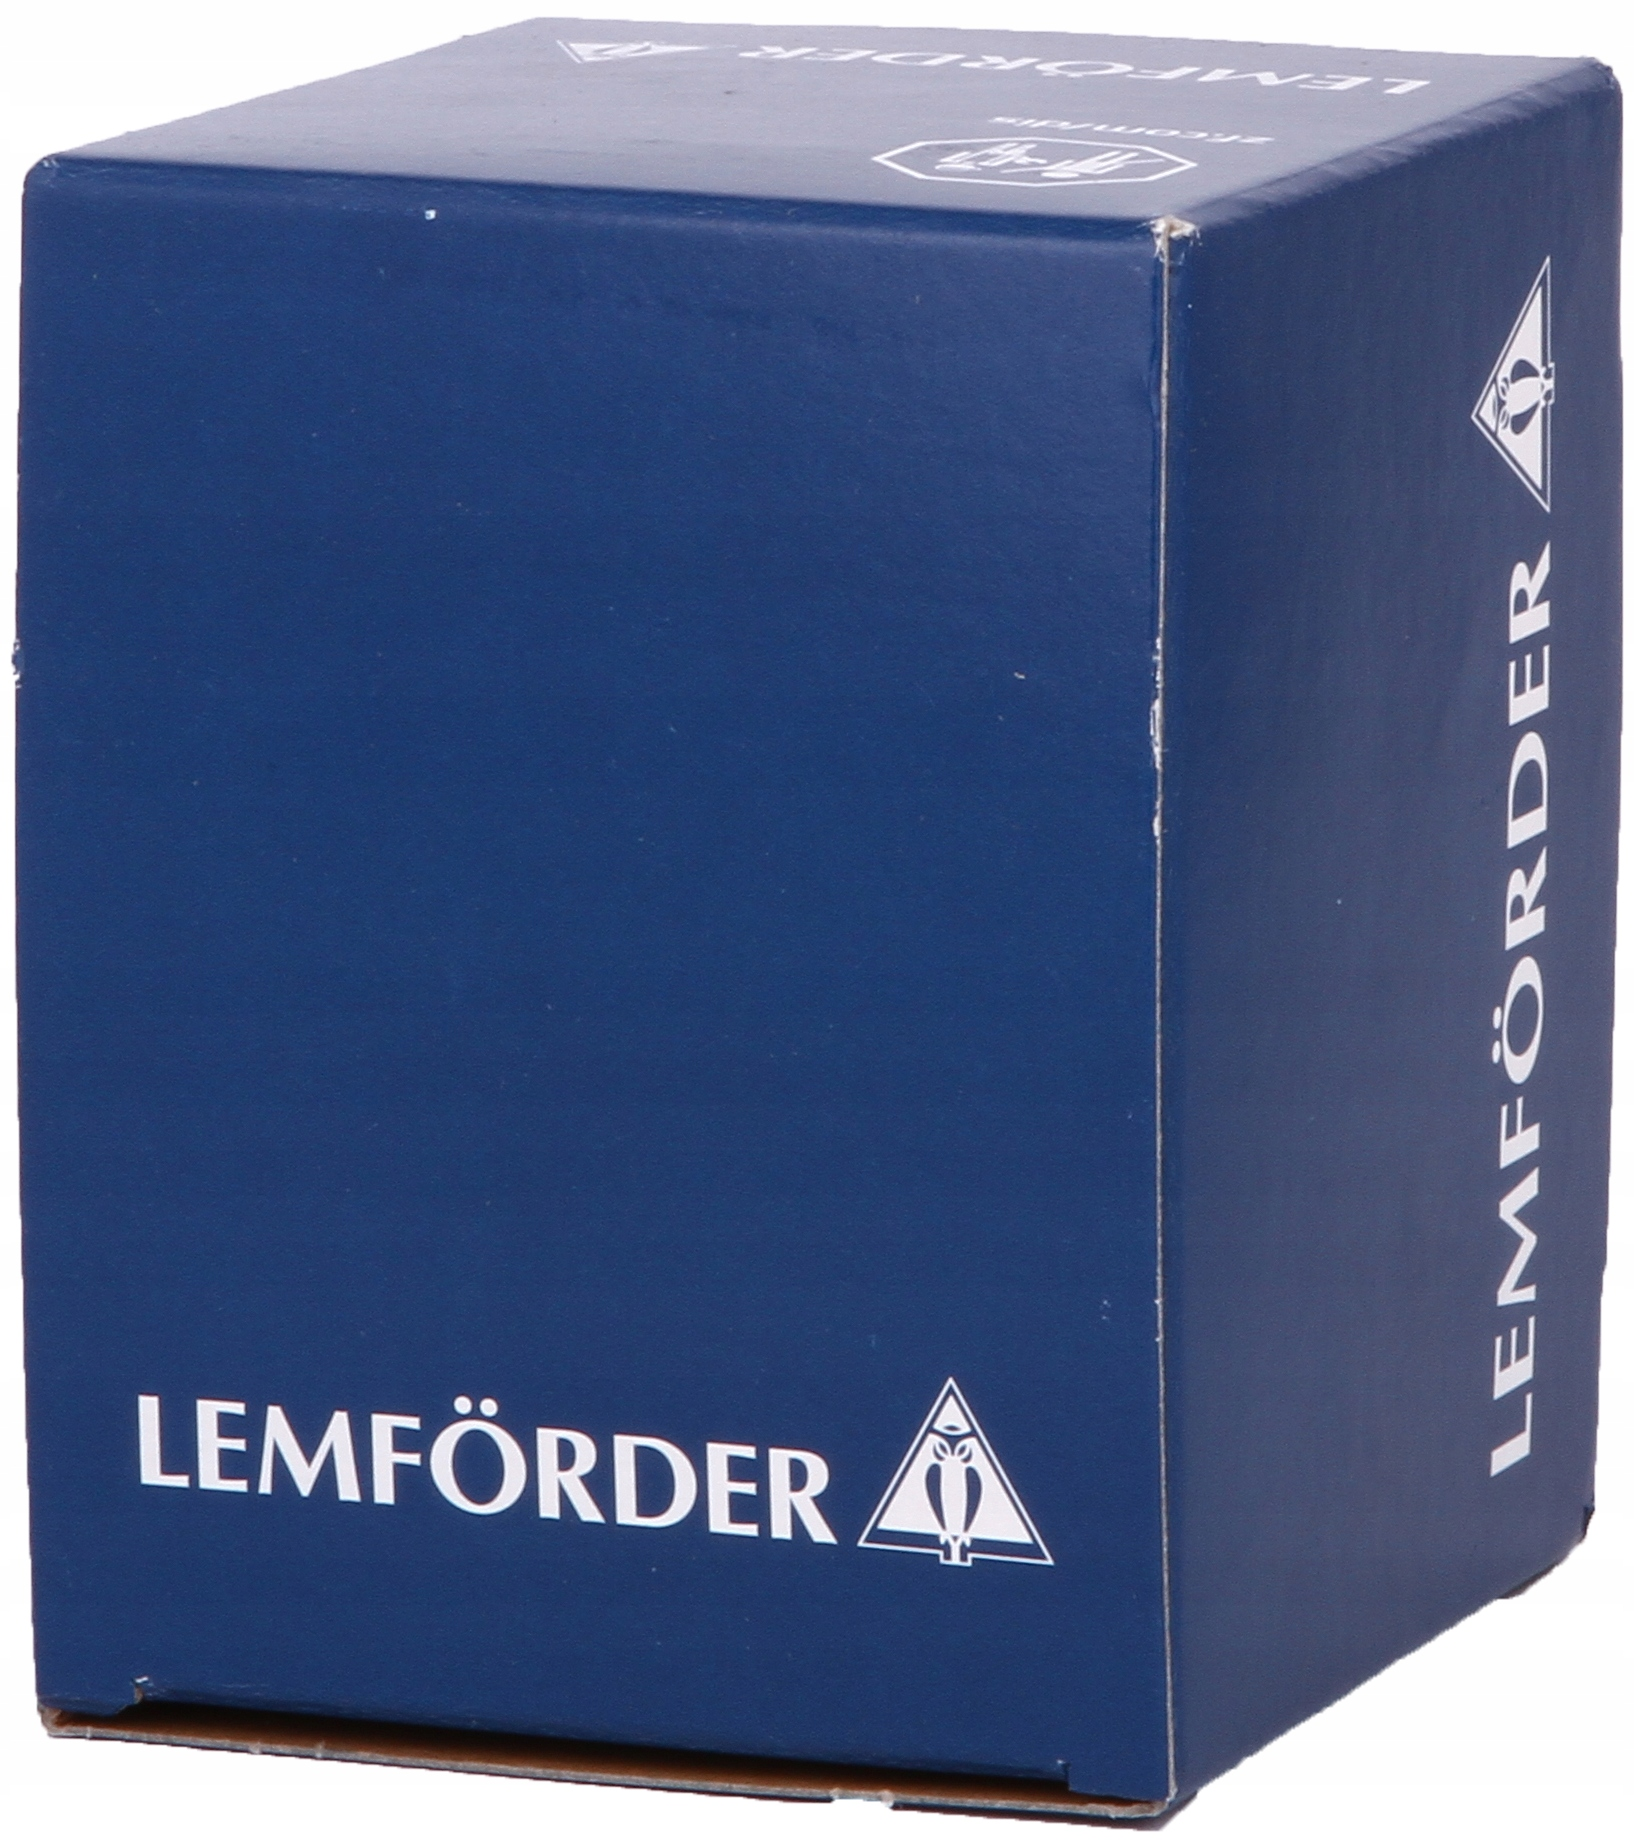 lemforder 30192 01